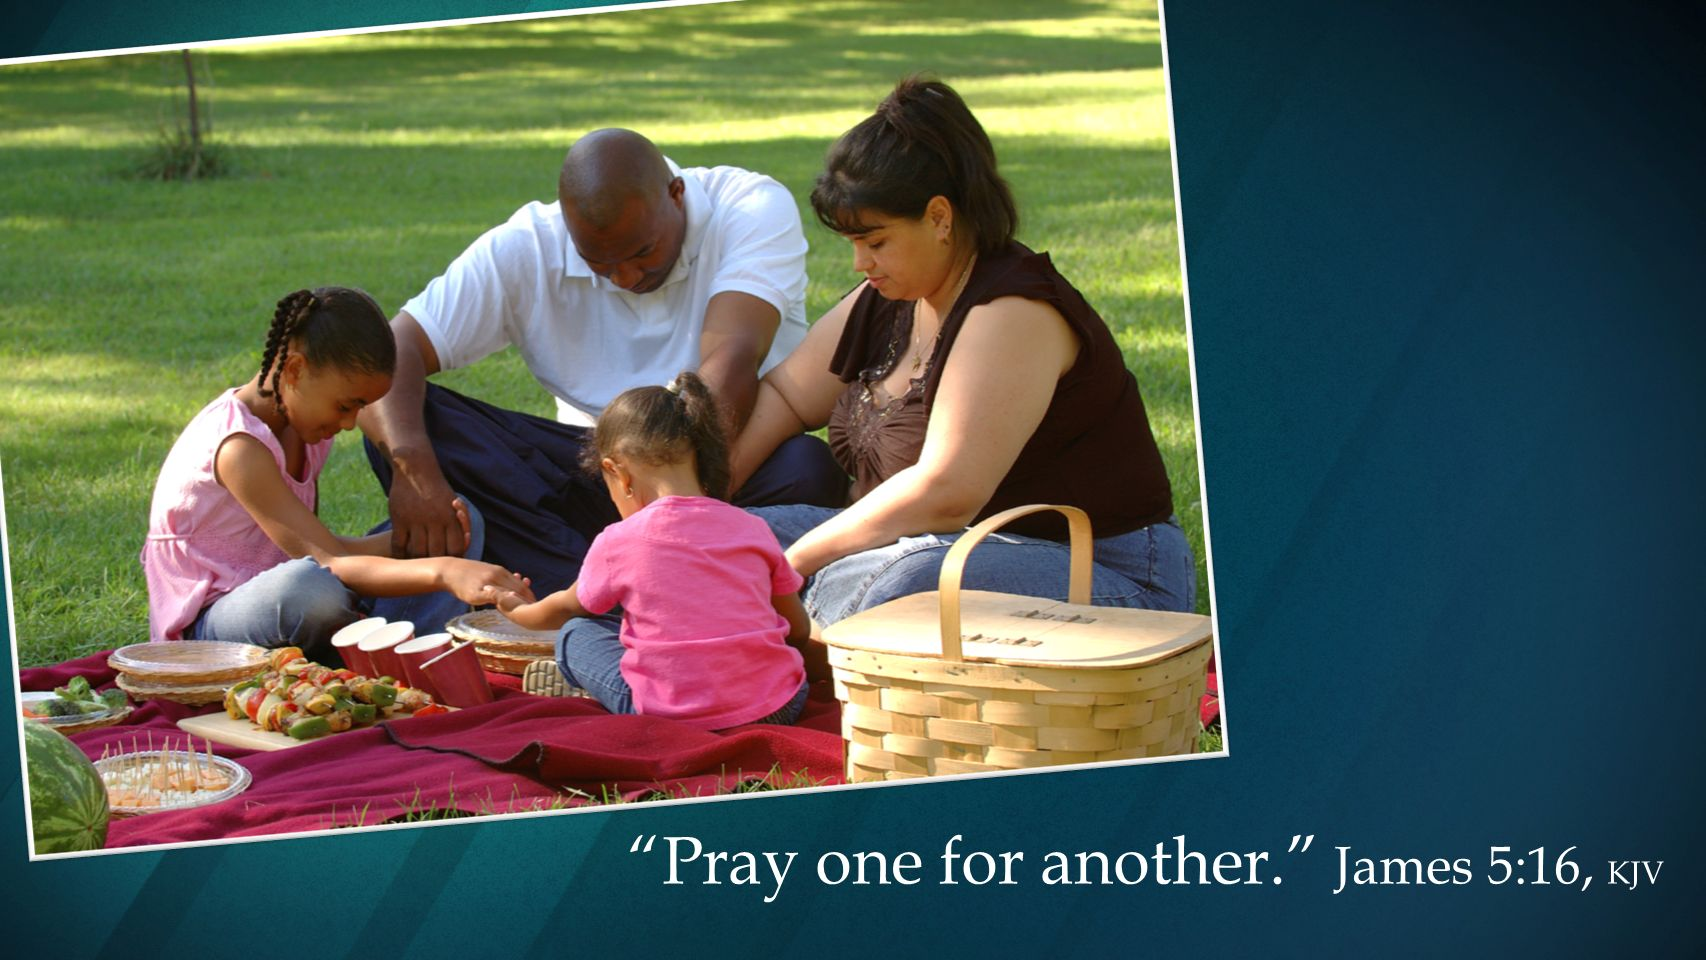 Pray one for another. James 5:16, KJV